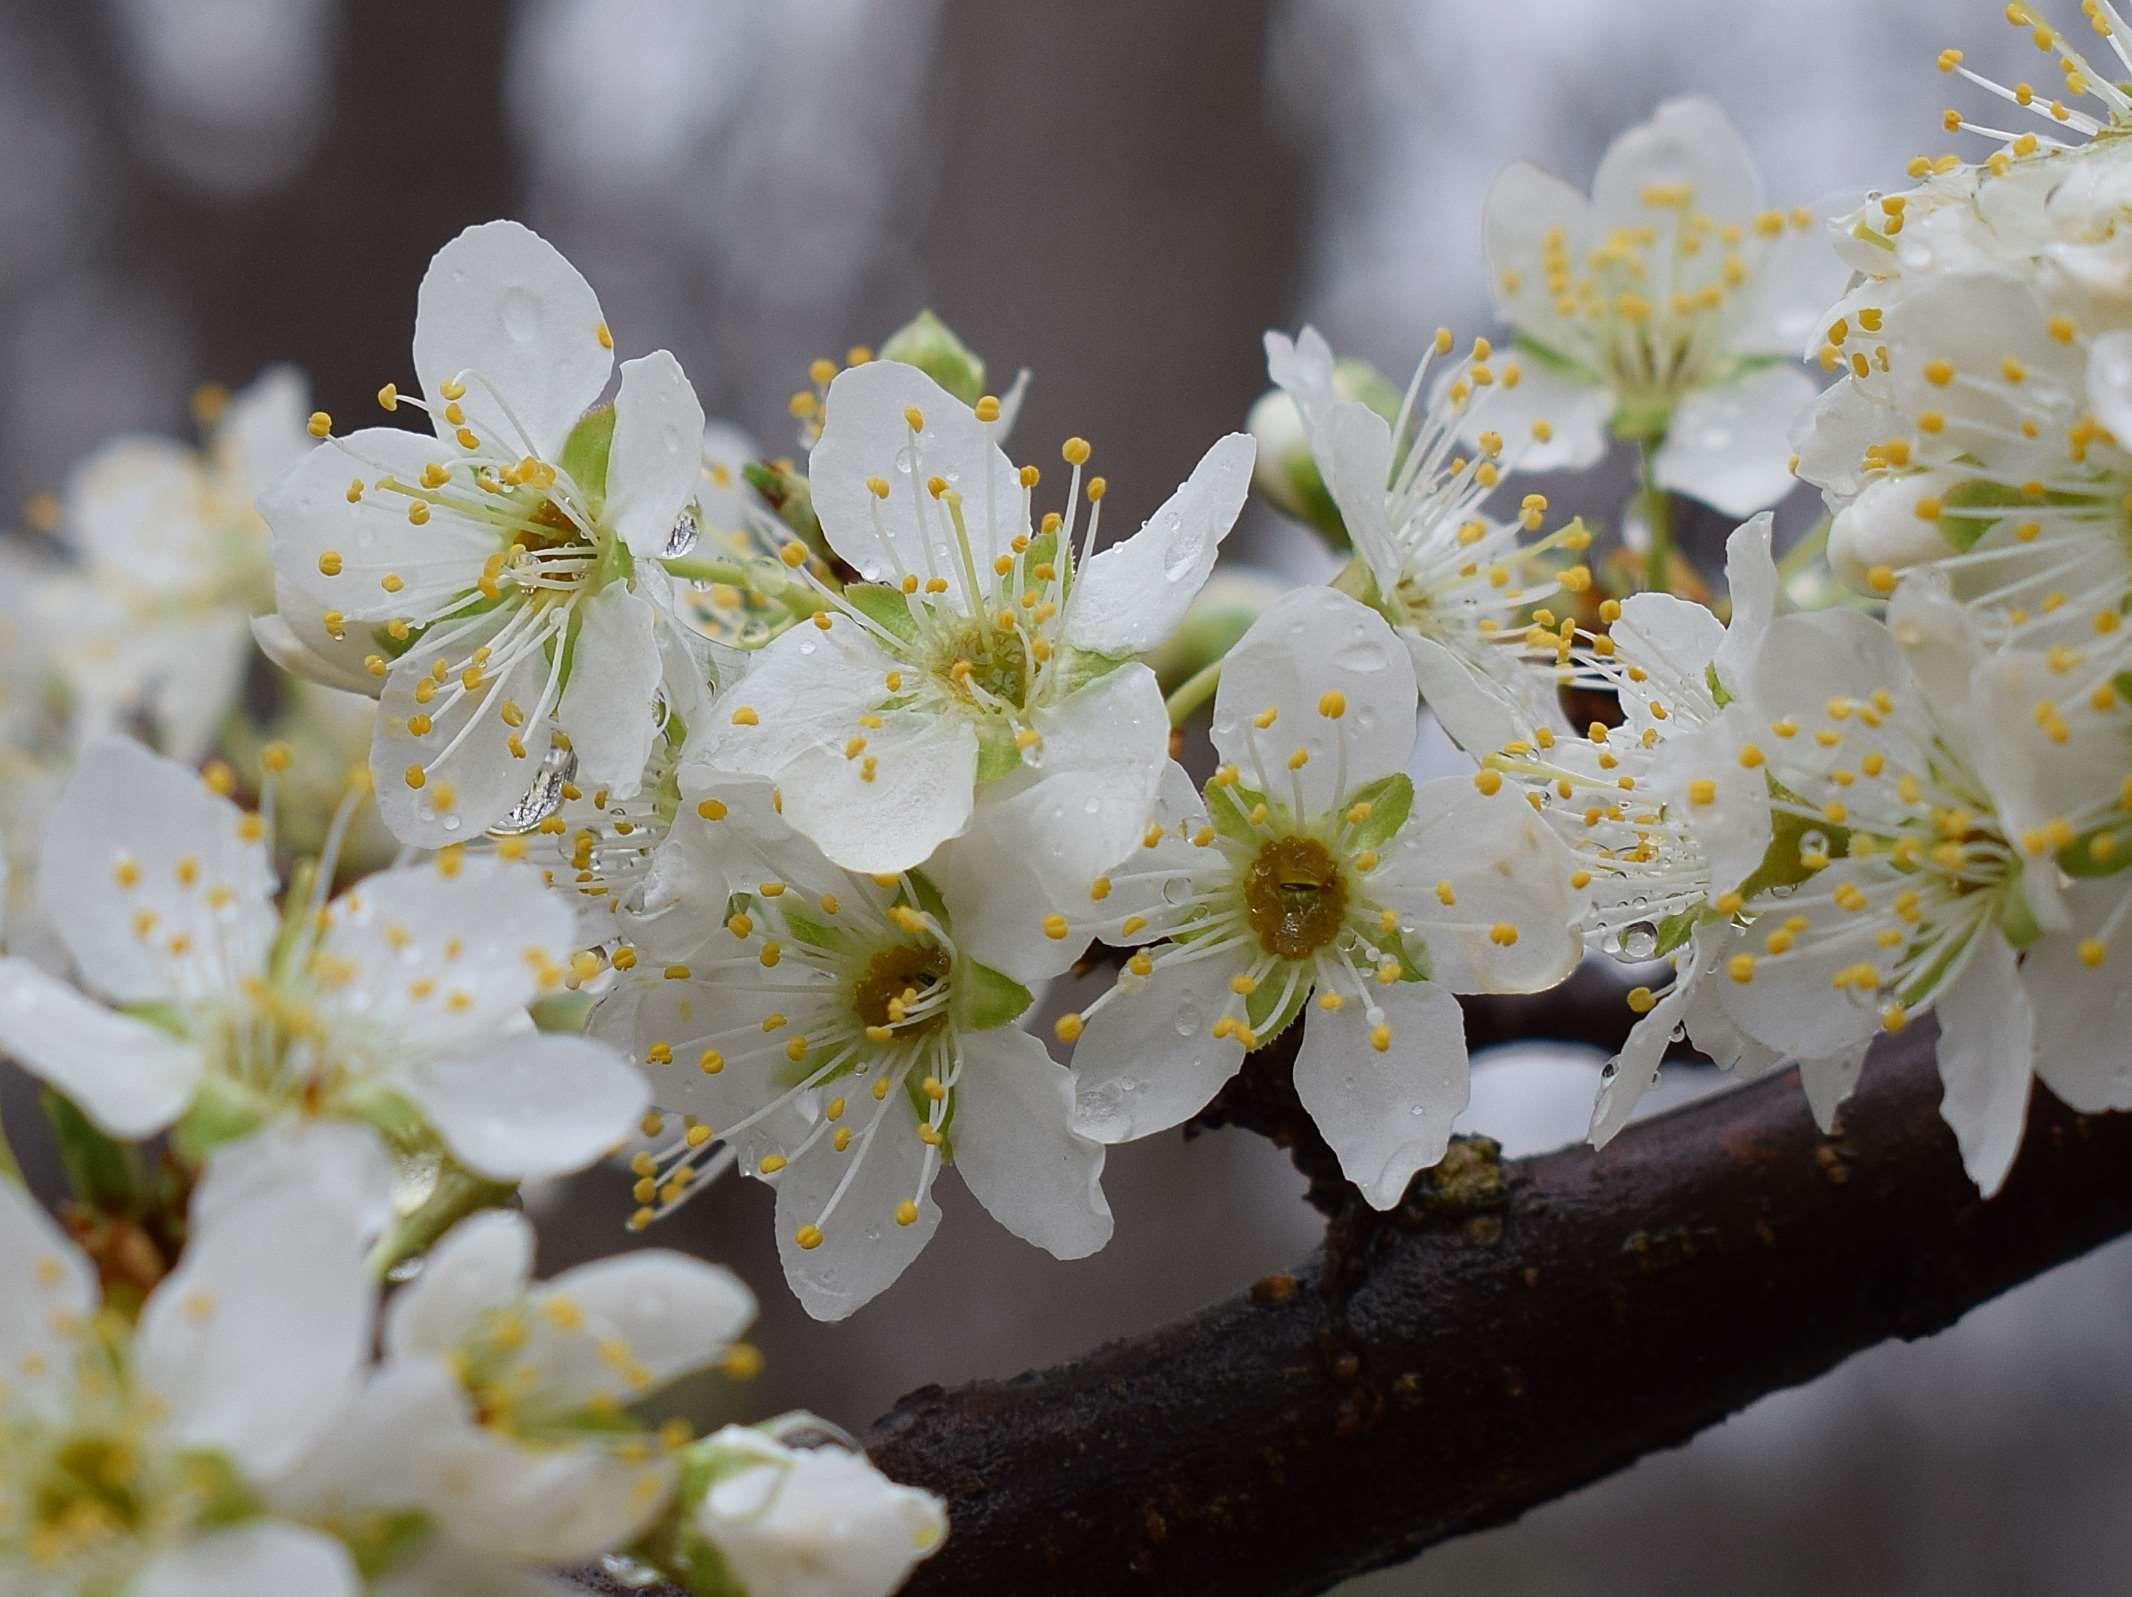 Bloom Blossom Cherry Cherry Blossoms In The Rain Cherry Tree Edible Flower Fruit Nature Rain Raindrops Spring Springti Bloom Blossom Blossom Bloom